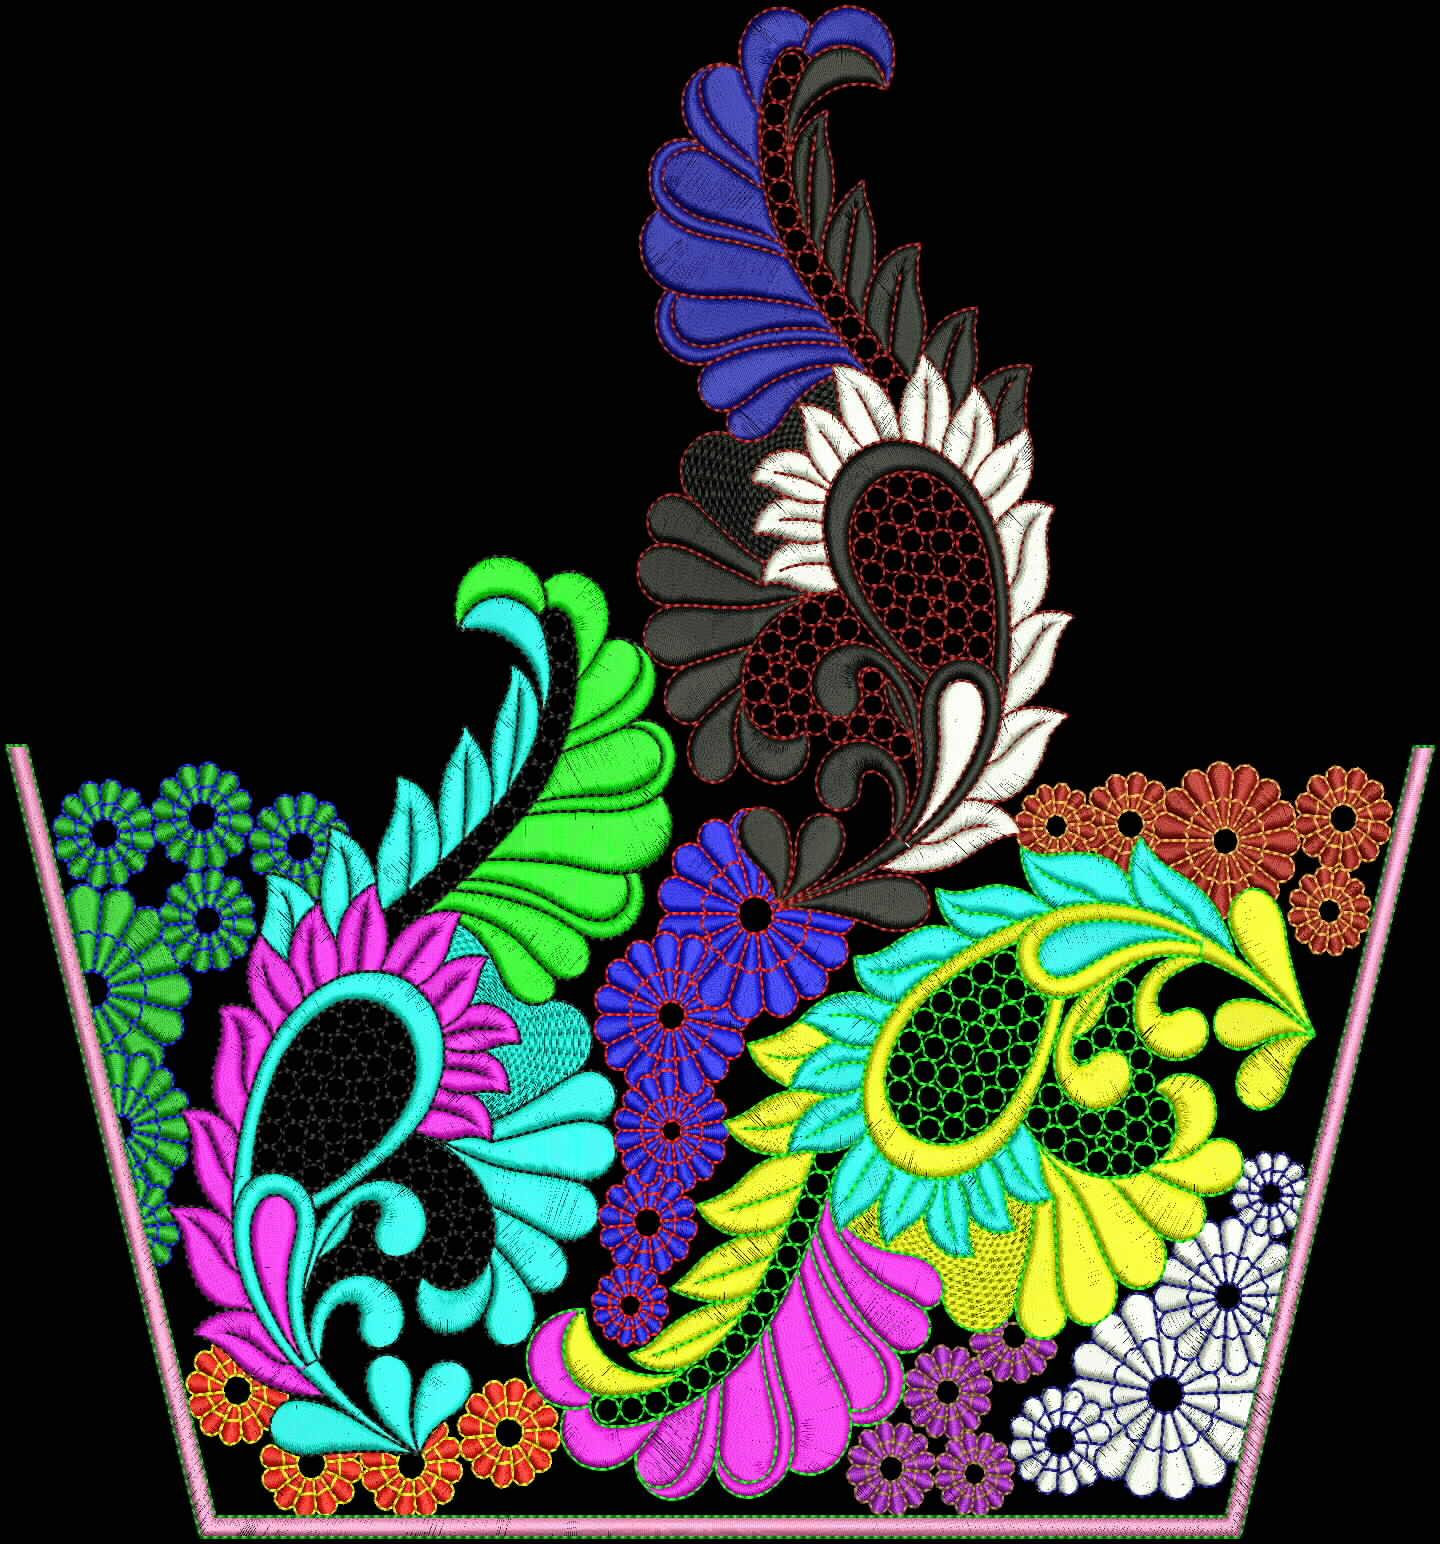 Sherry's Embroidery Digitizing: Arebian Neck Embroidery